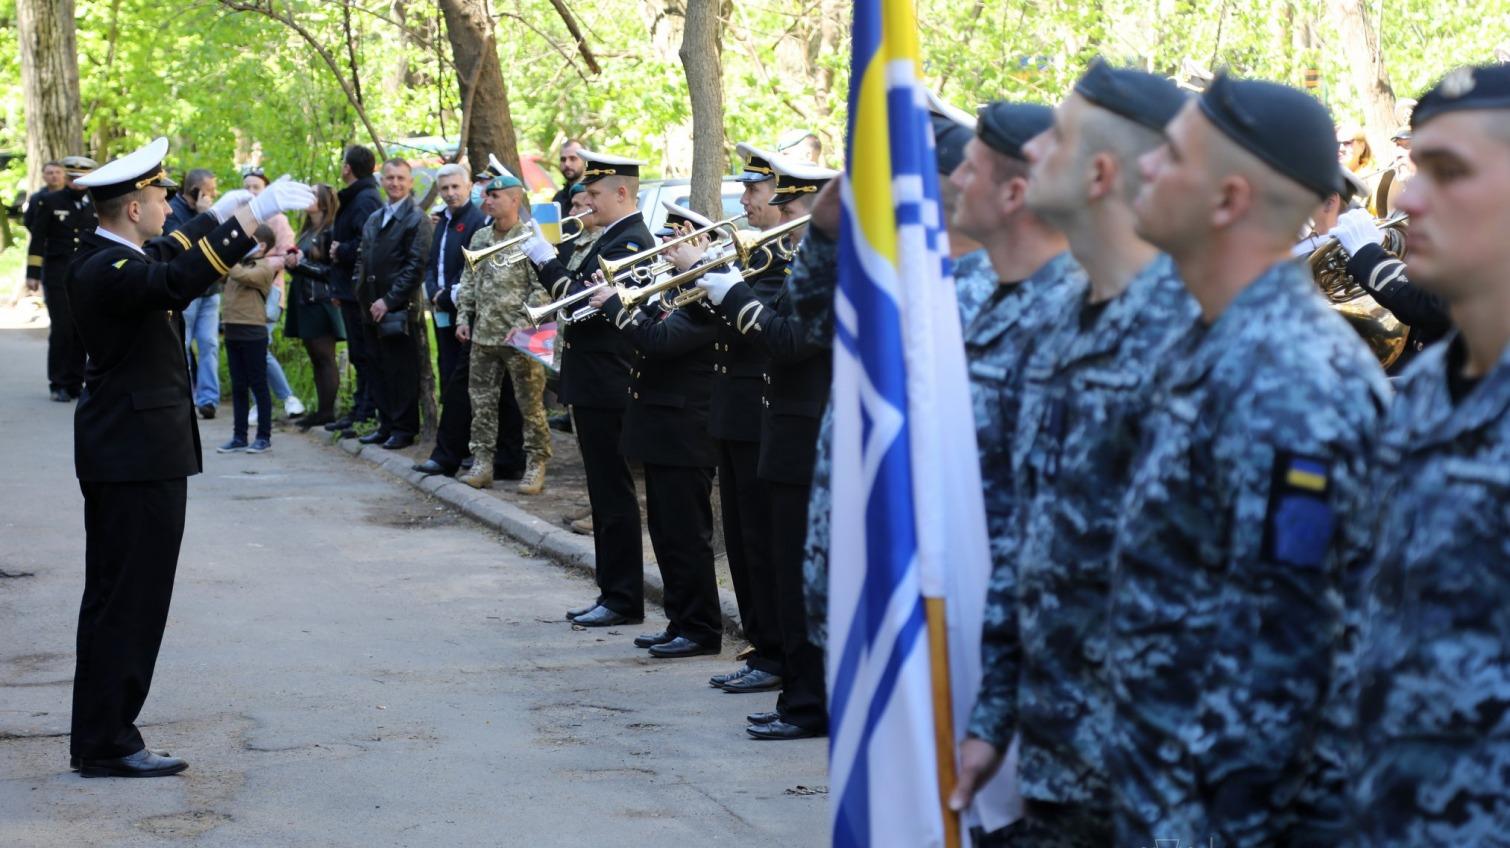 Концерт под балконом: в Одессе поздравили ветерана (фото, видео) «фото»